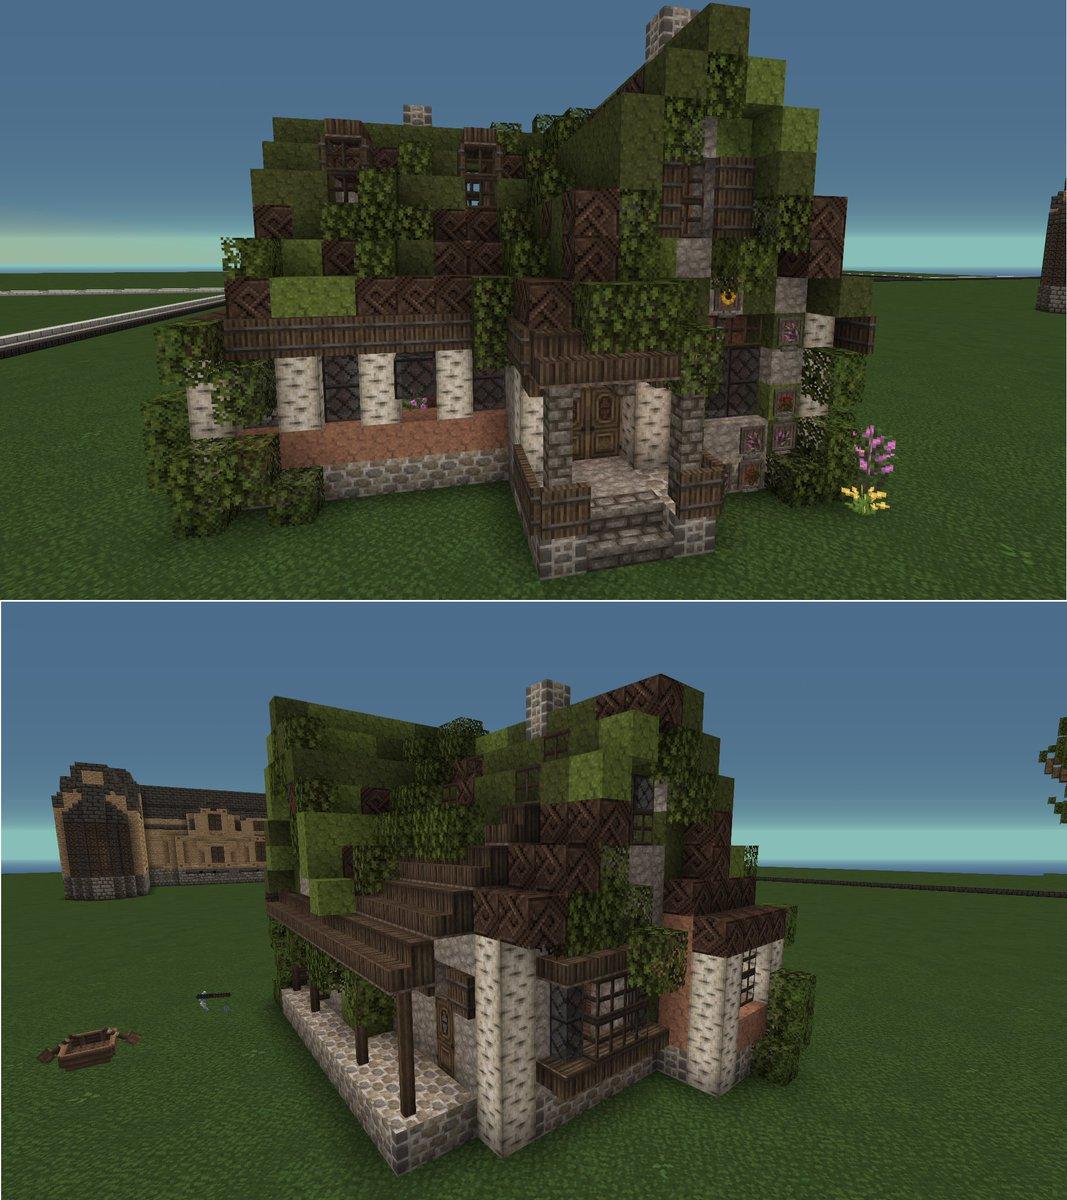 Little mossy cottage loosely based on a certain Studio Ghibli film~ #Minecraft #minecraftbuilds #videogamespic.twitter.com/MoscEztJMj